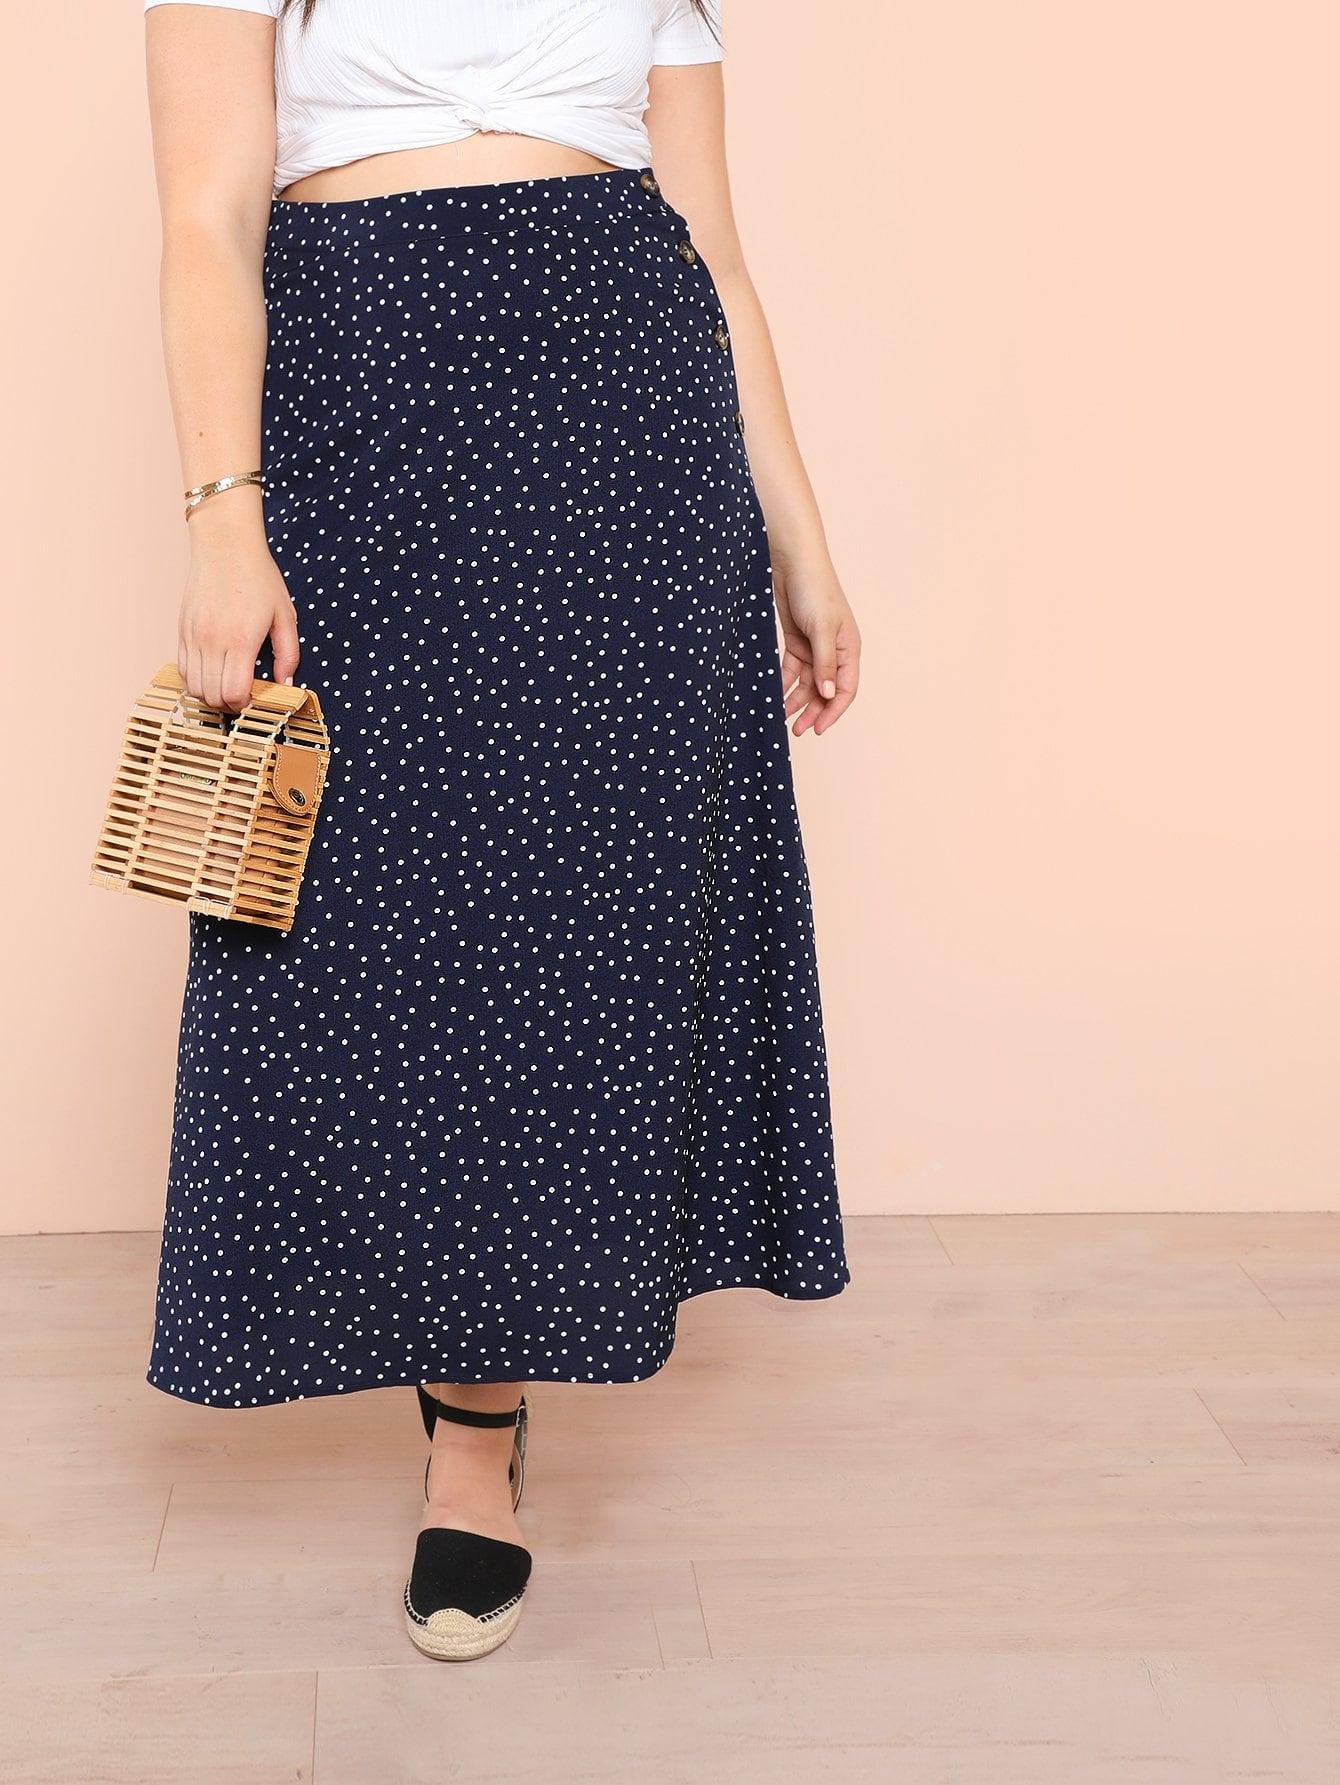 Plus Polka Dot Button Side Wrap Skirt платье yumi yumi платье